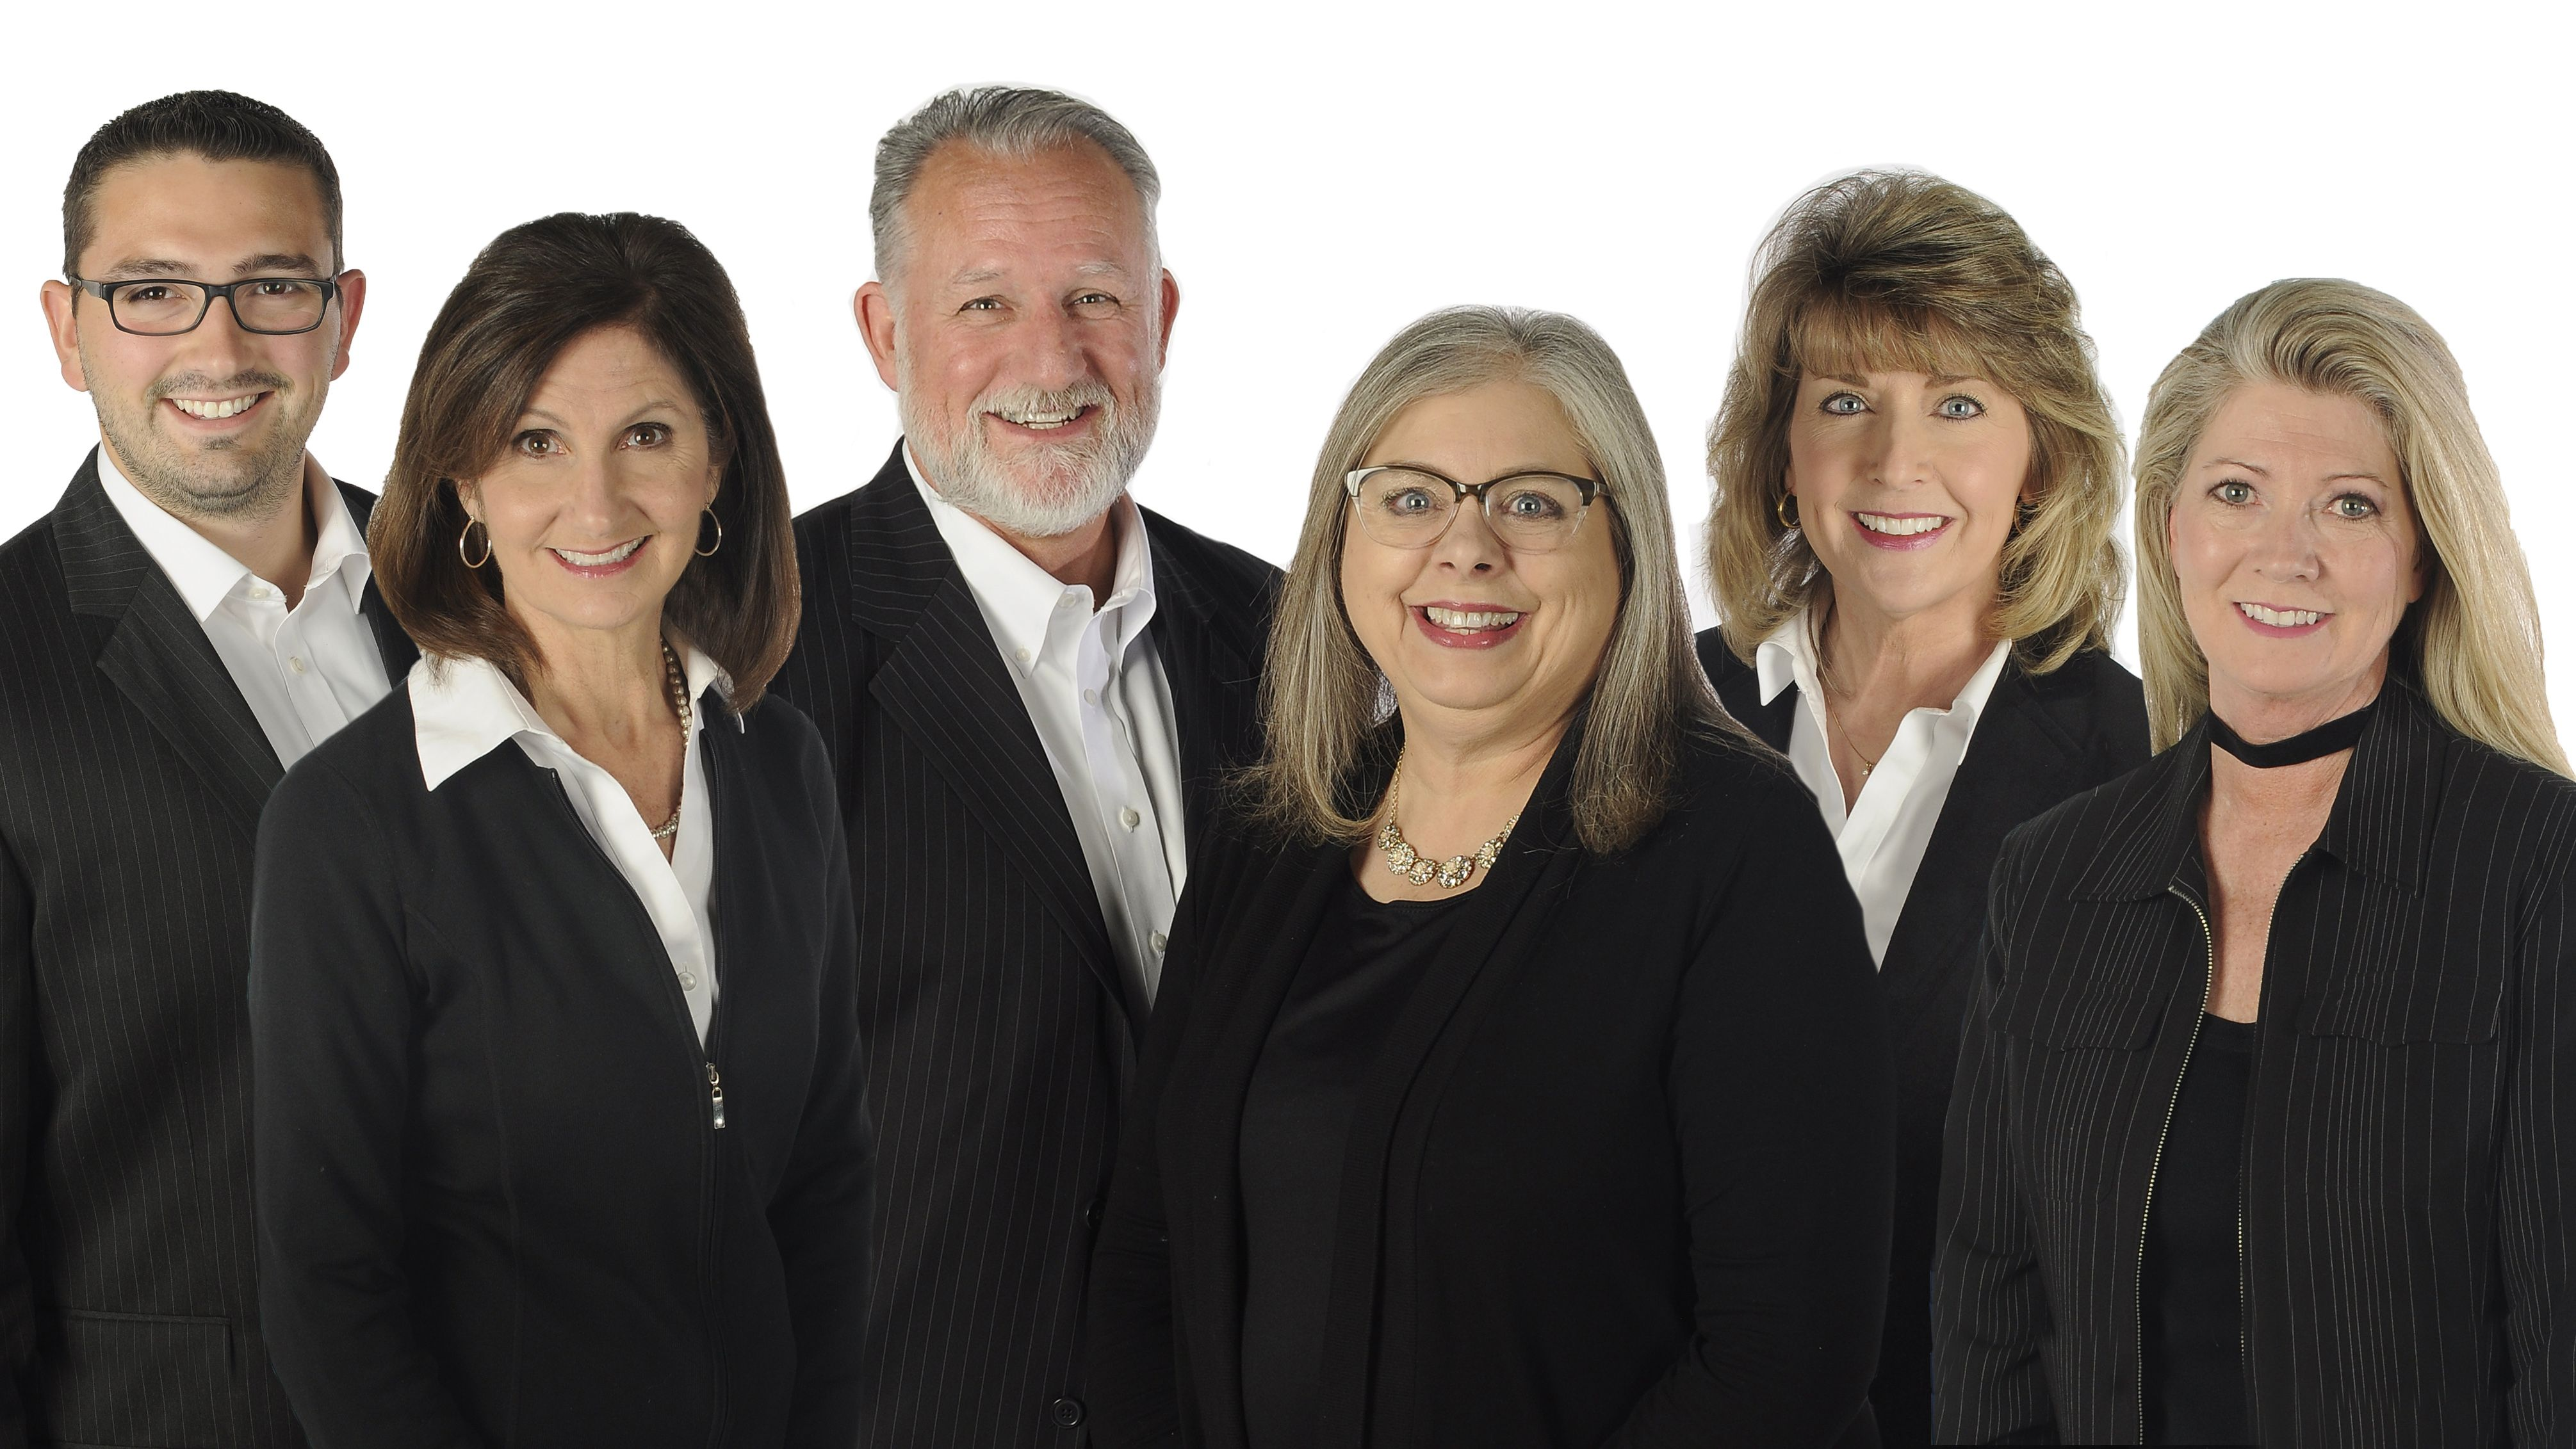 The Bill Black Team's Photo